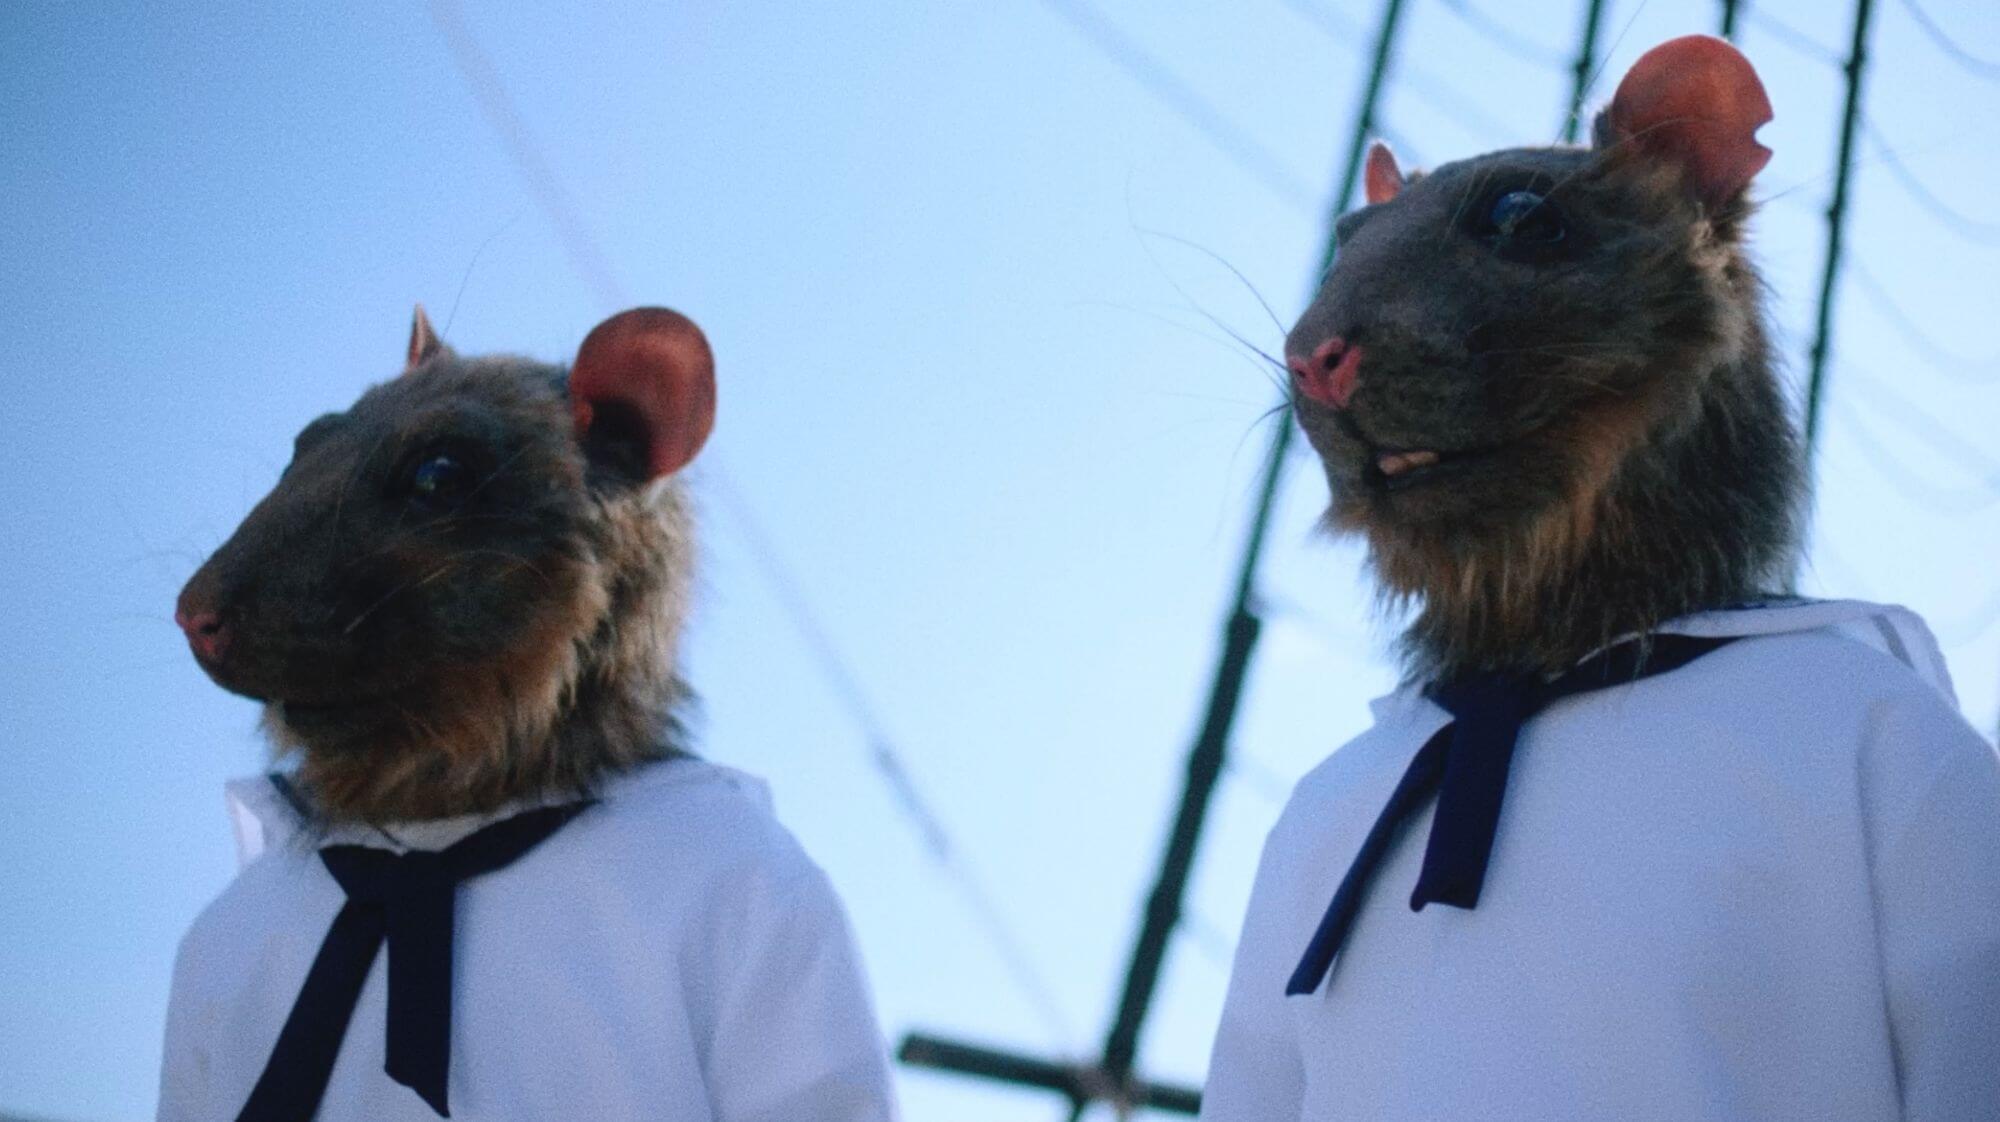 Strawberry Mansion - Fantasia Film Festival